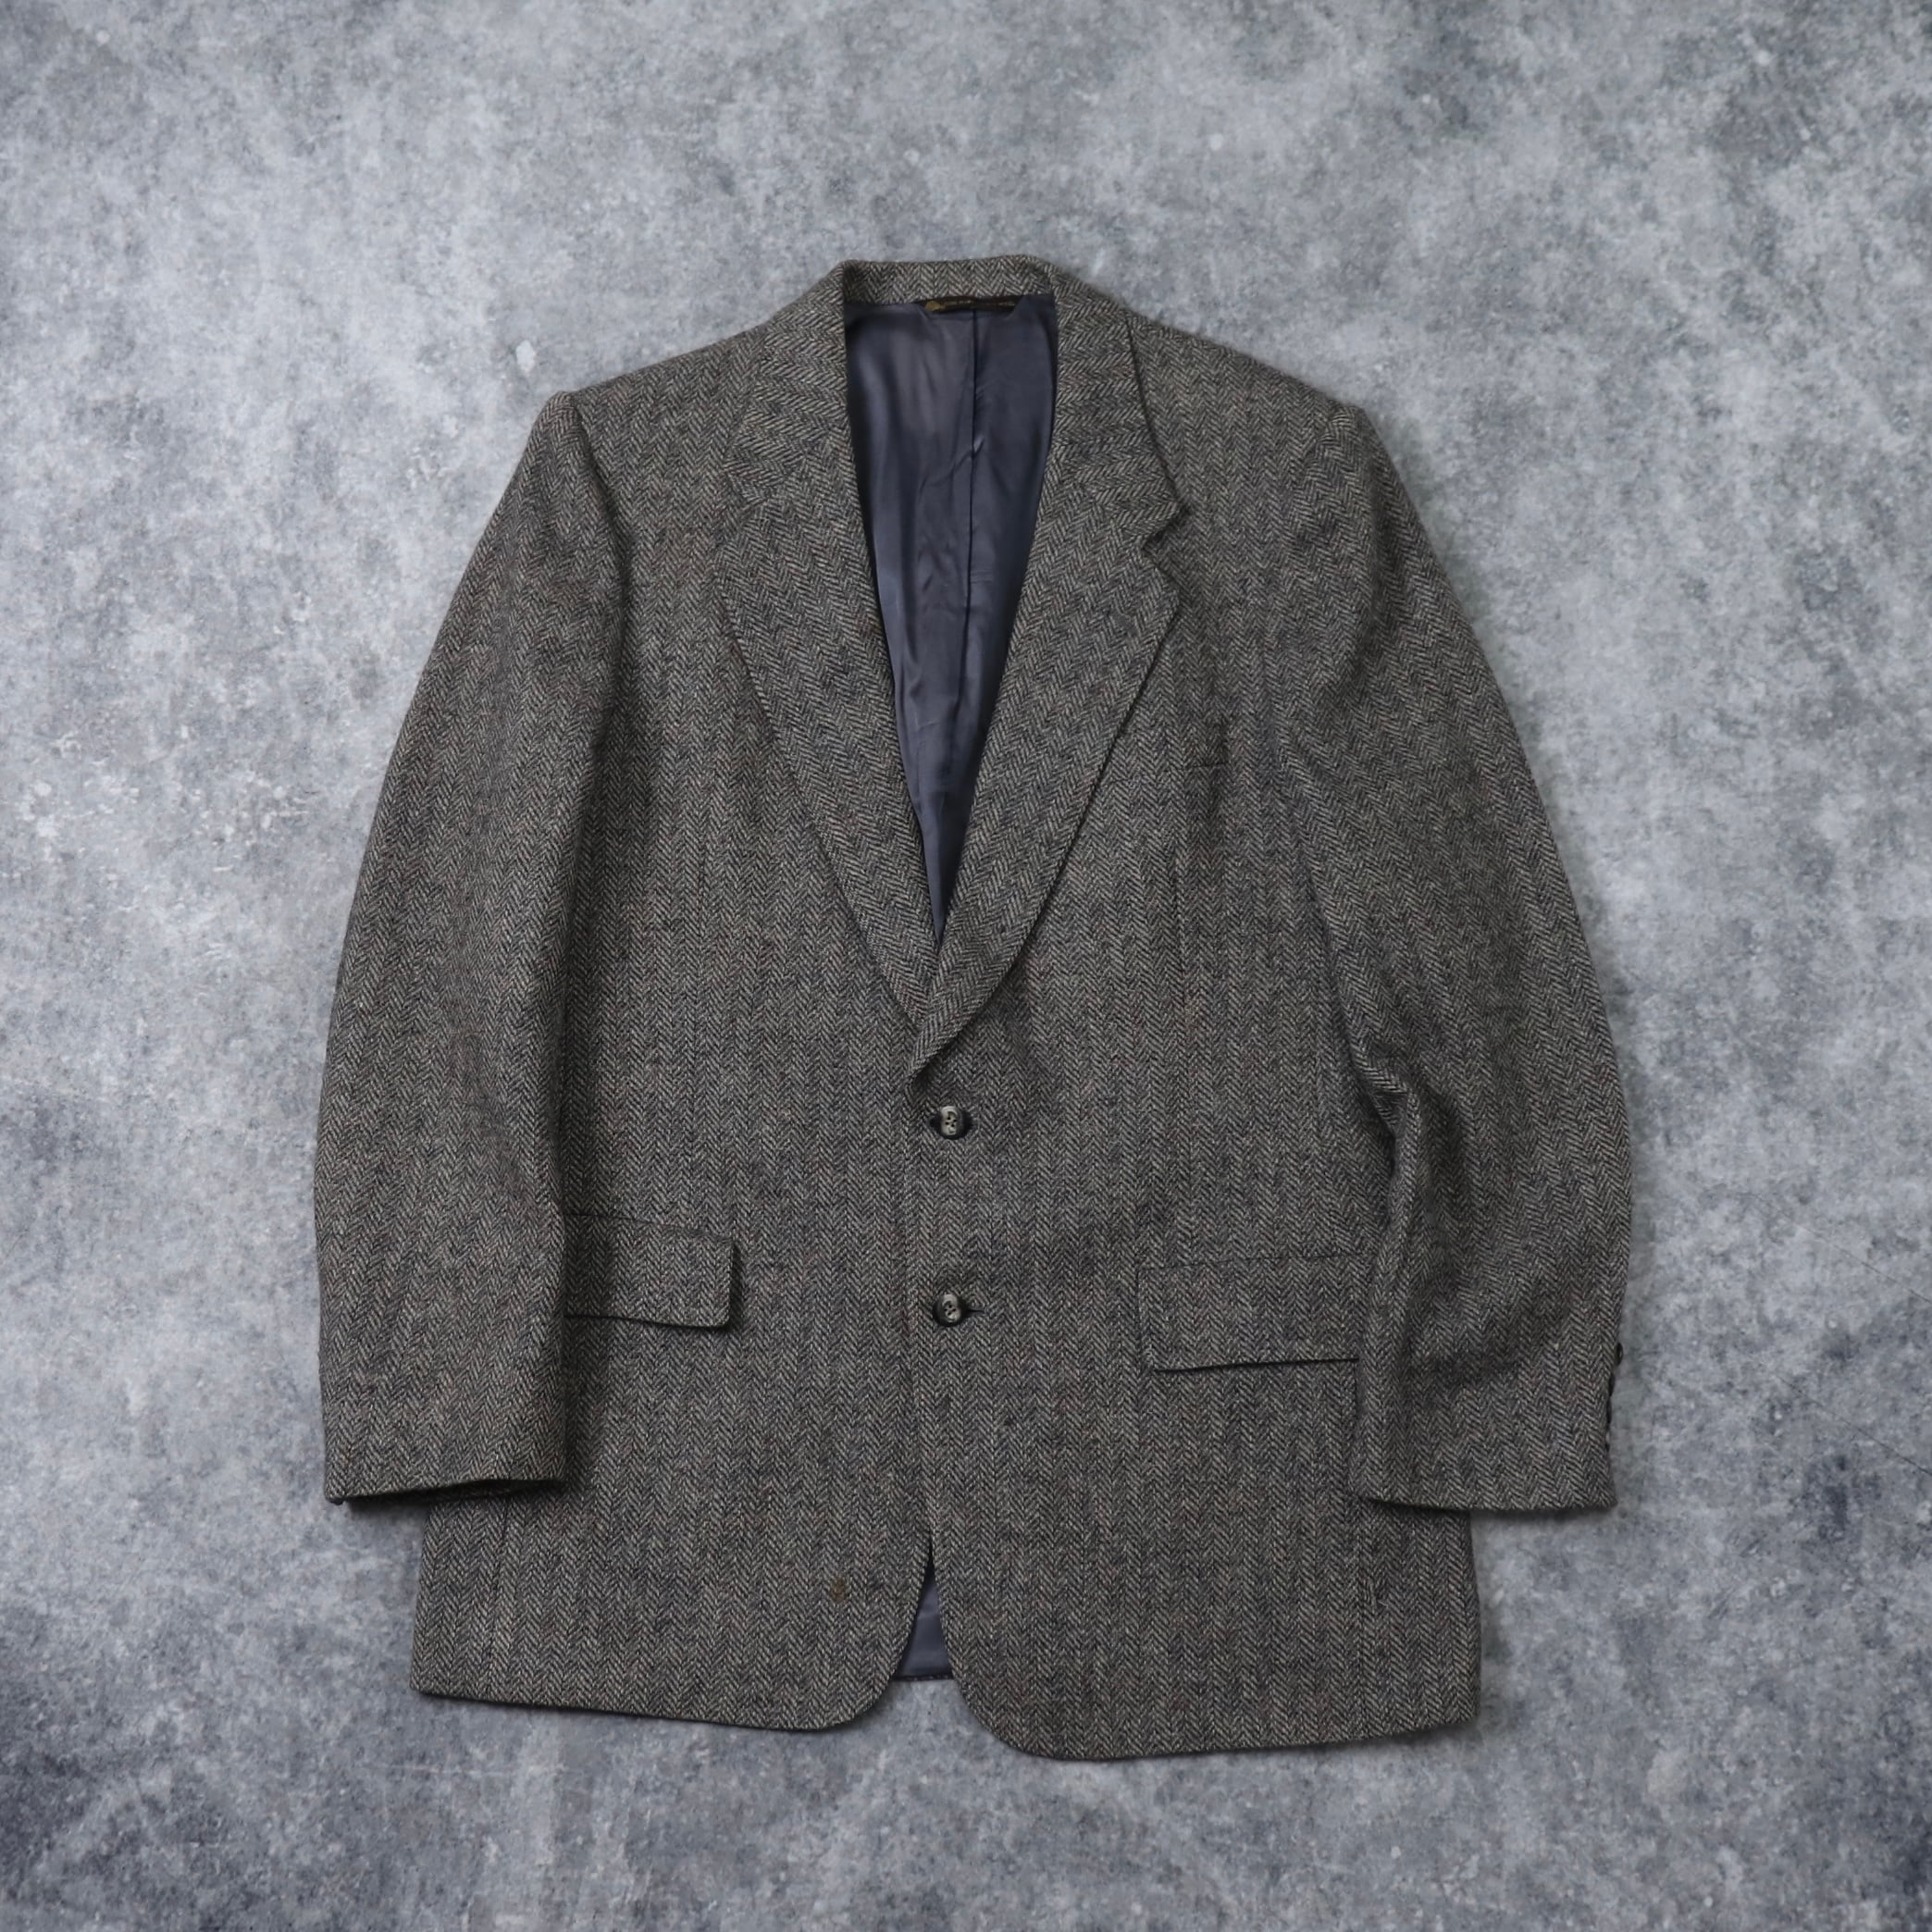 "70s  "" Christian Dior ""  Tailored Jacket   70年代 クリスチャンディオール テーラードジャケット ツイード グレー 古着 A624"